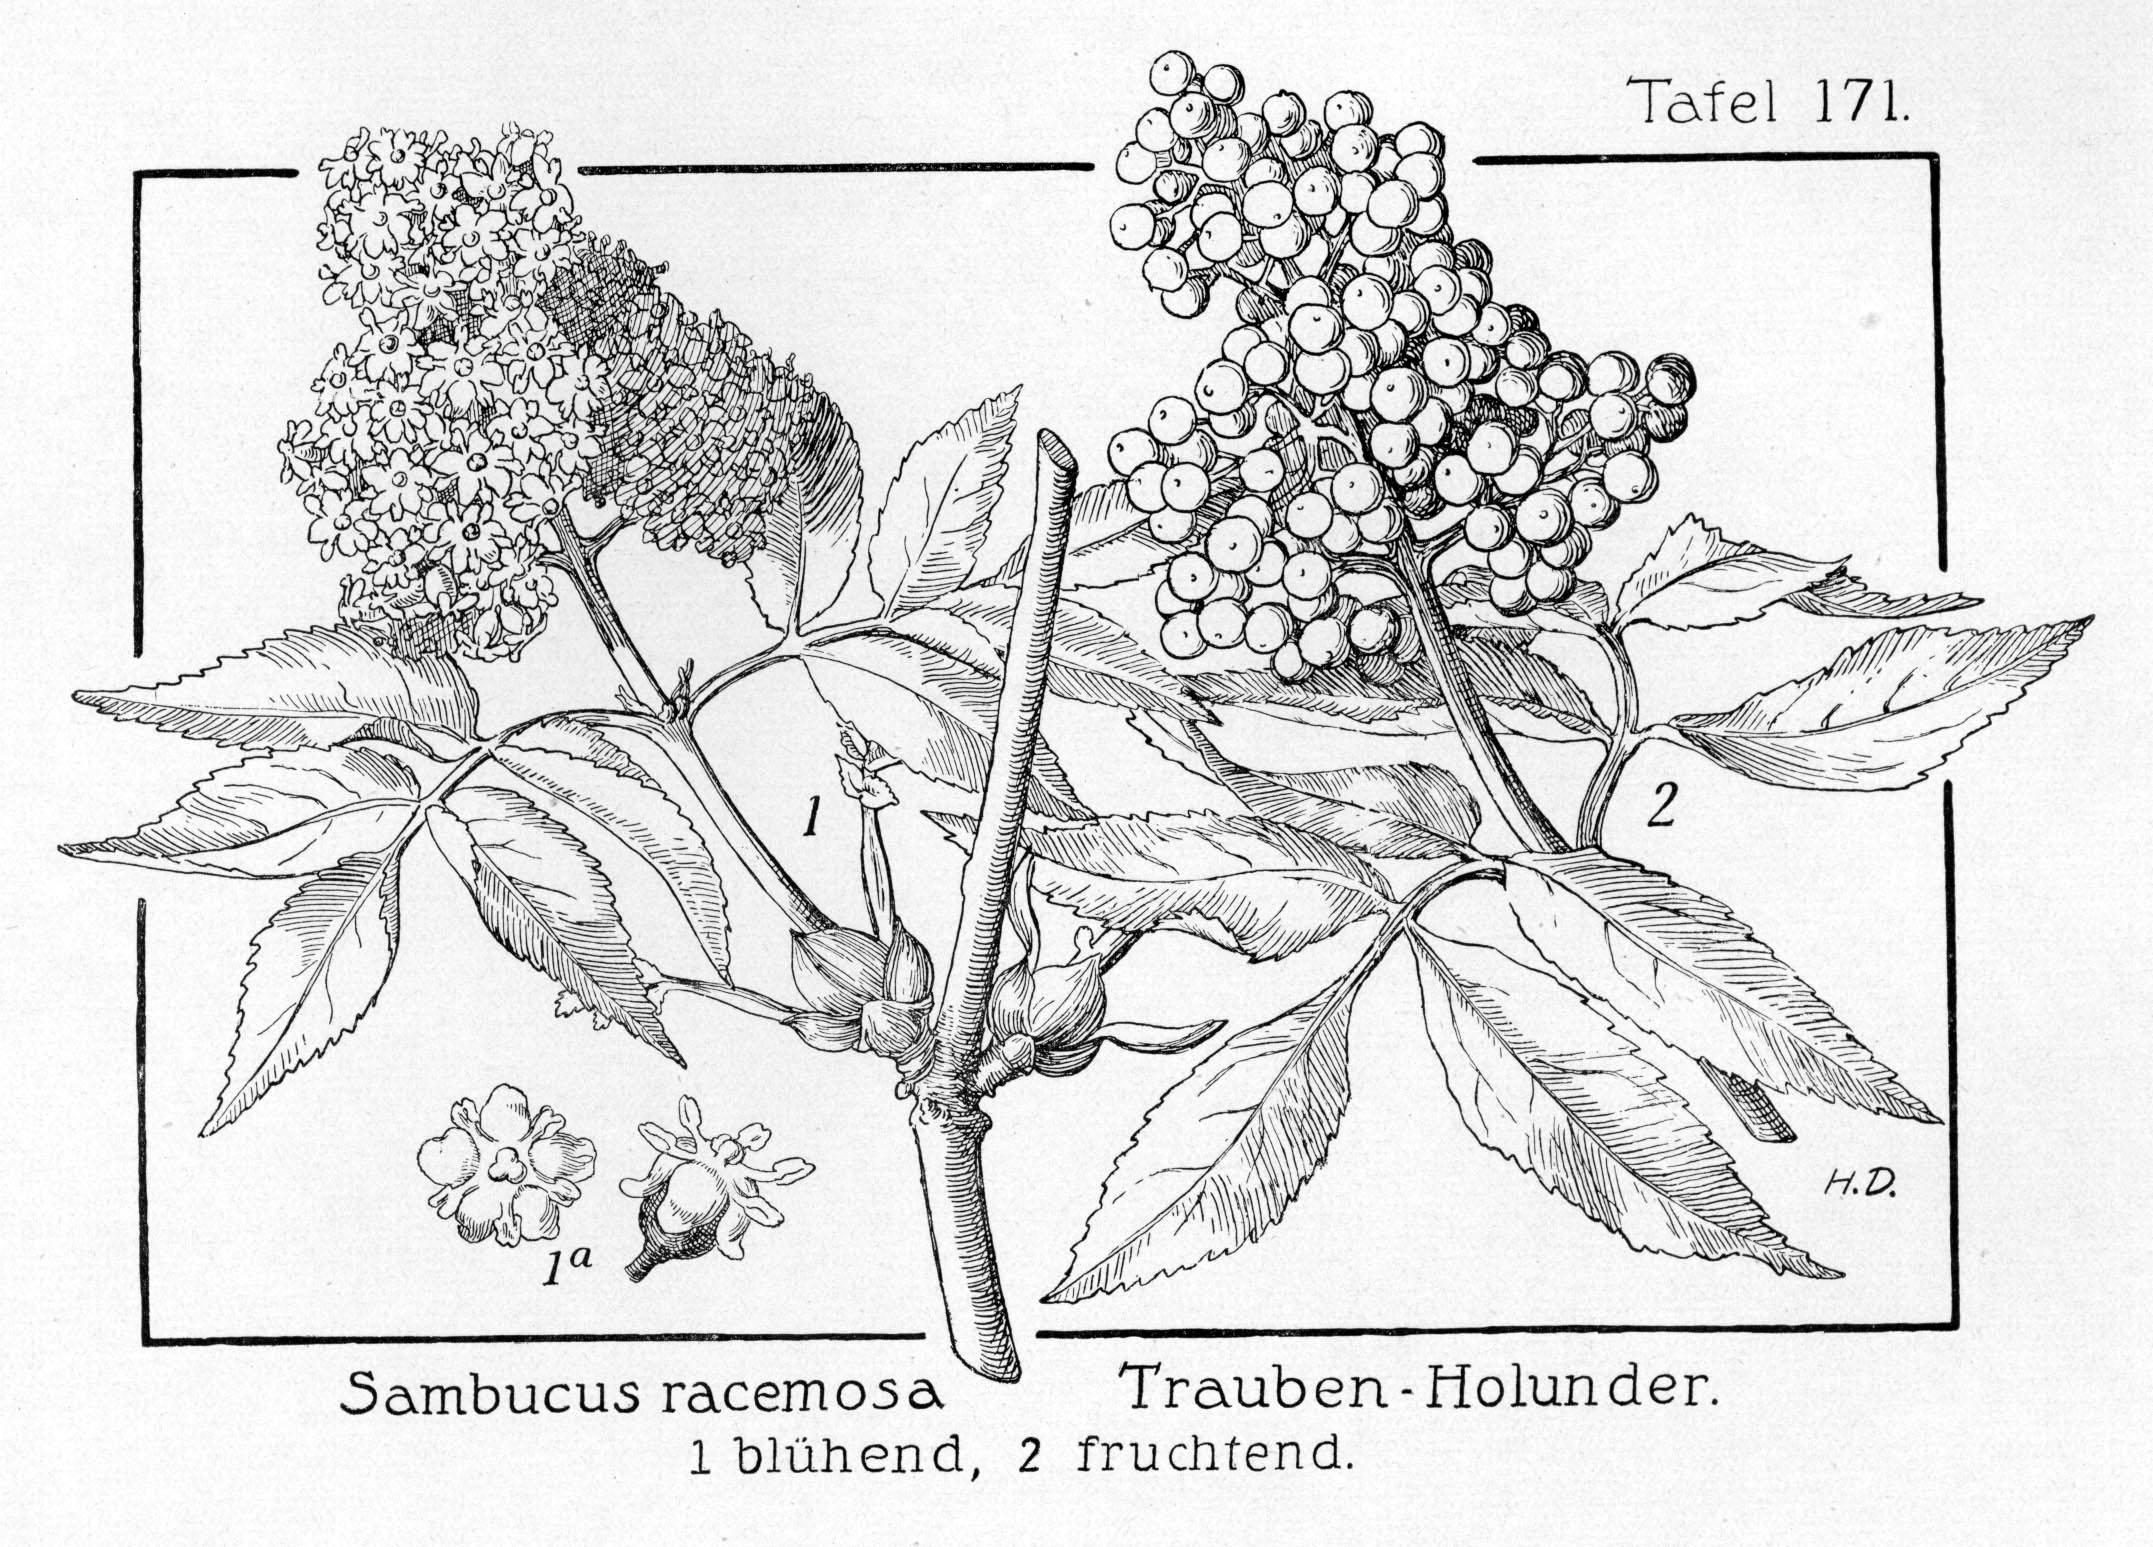 Tafel_171Sambucus racemosa 1927